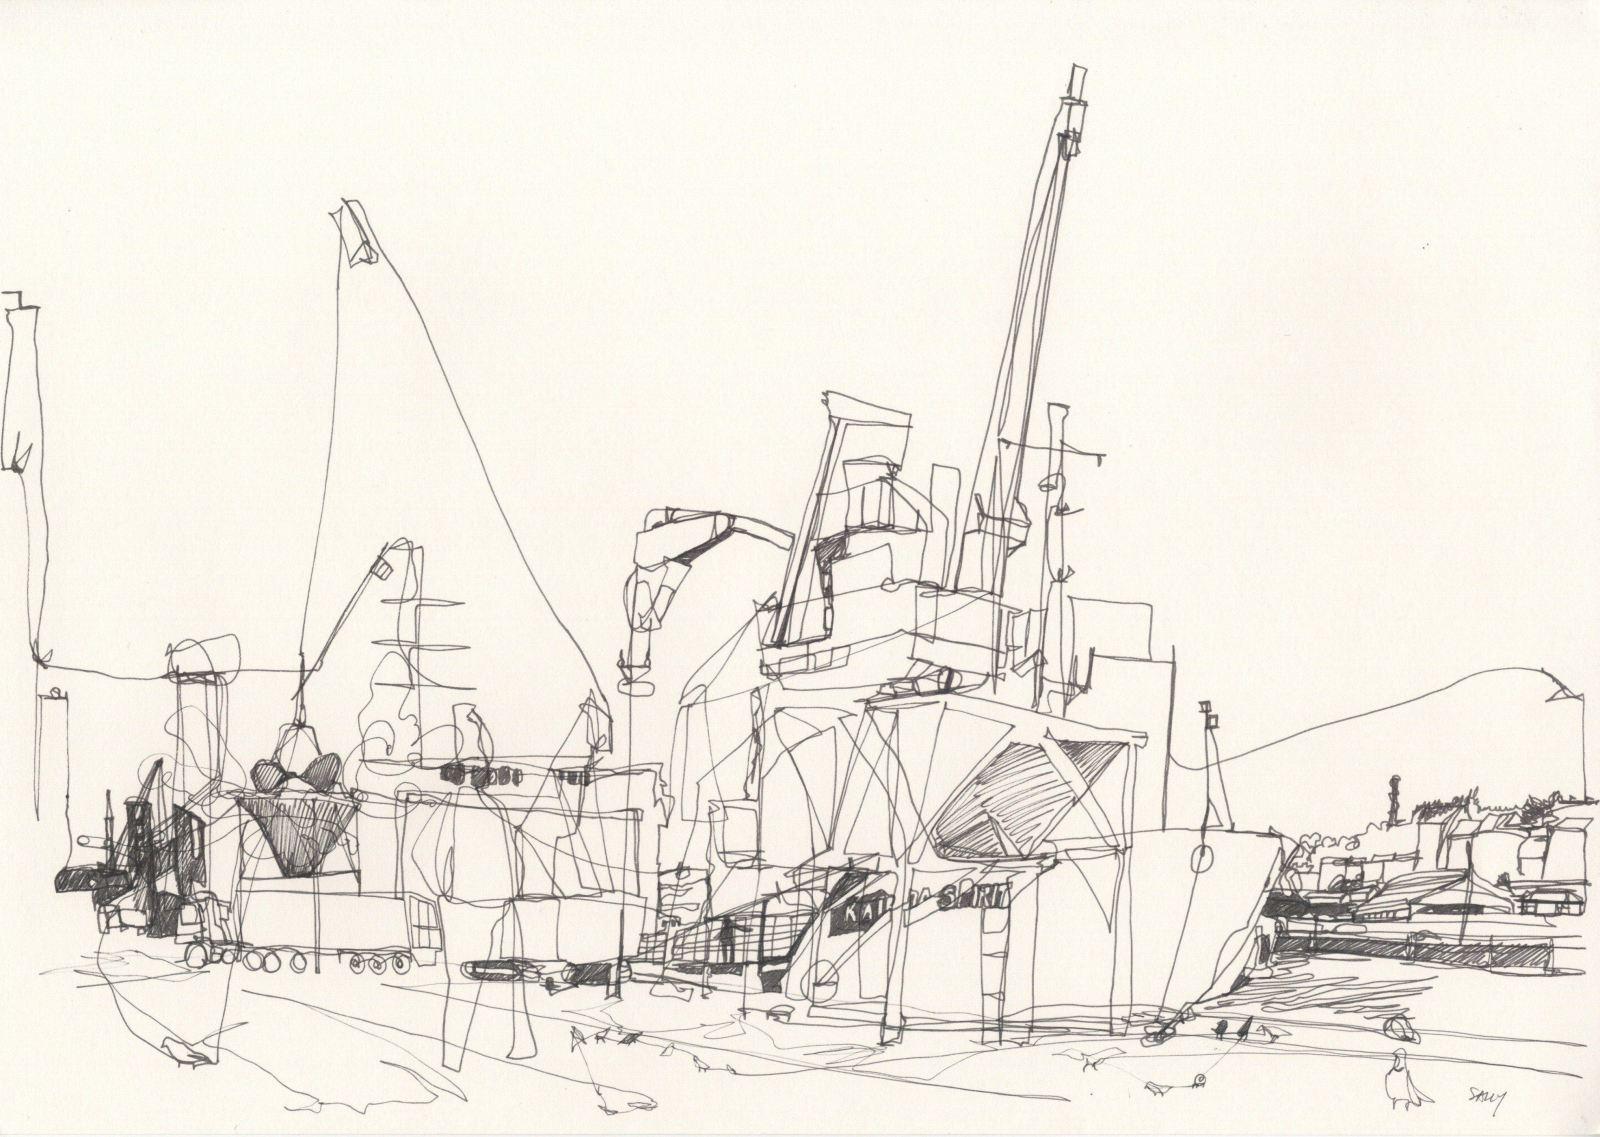 Port of Cork 2013